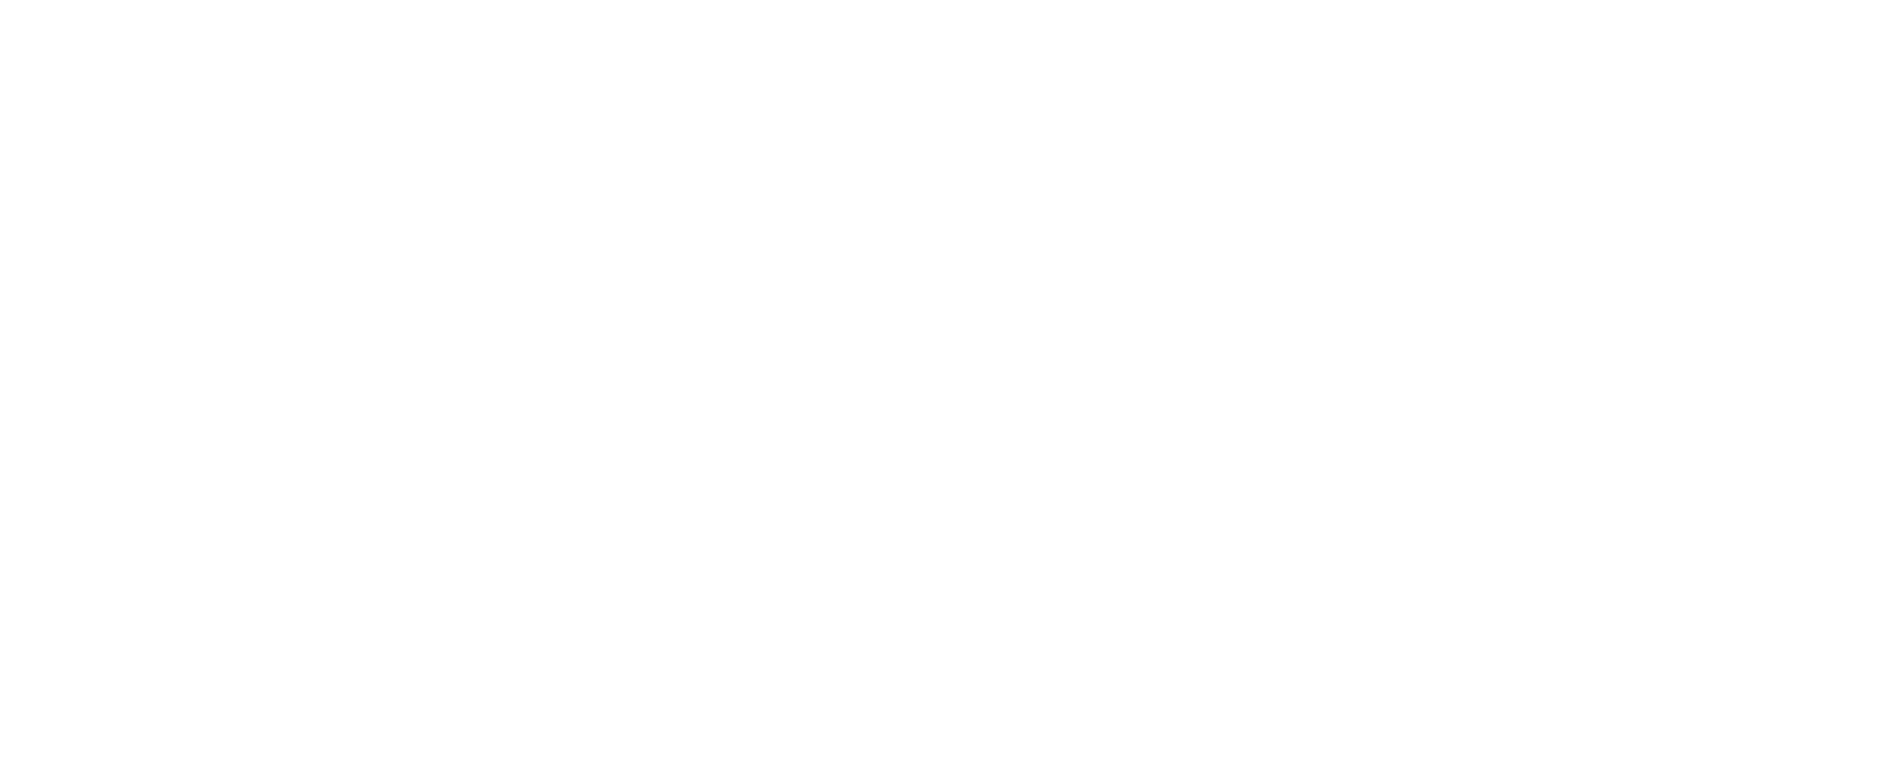 Awarays Cavaliere